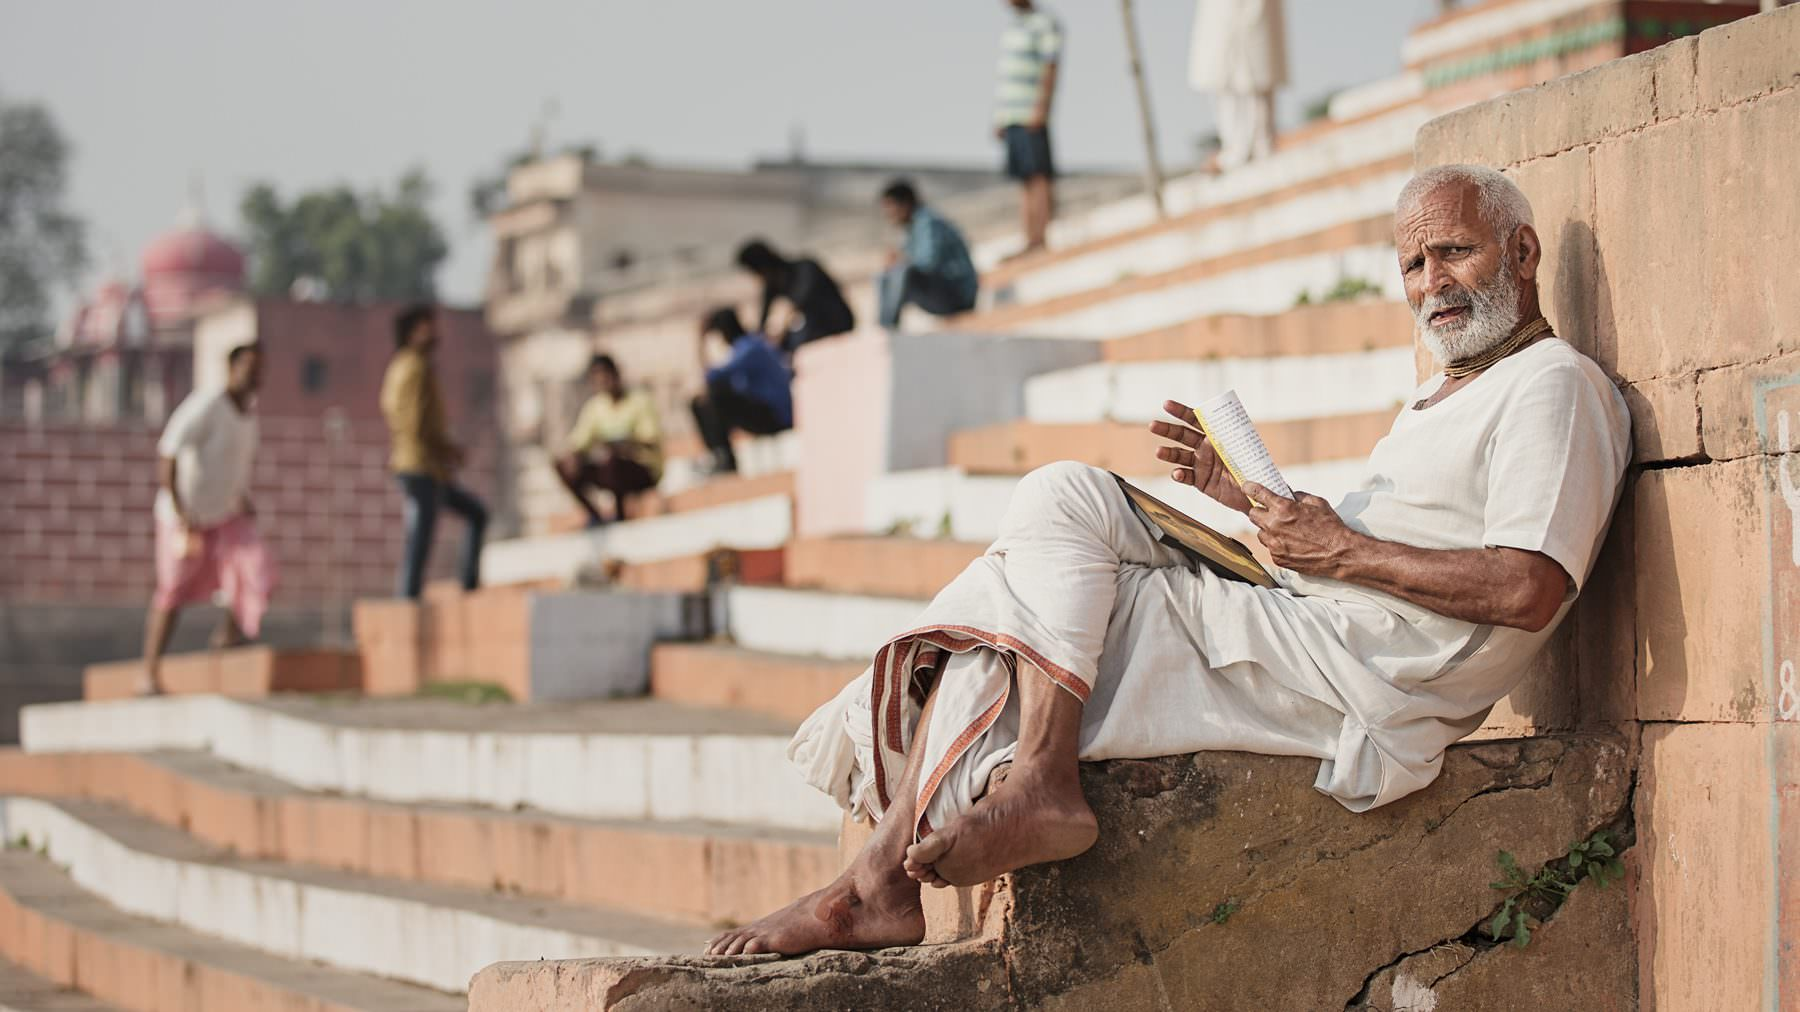 India, Varanasi, Ganga, Brahmin is preparing his speech